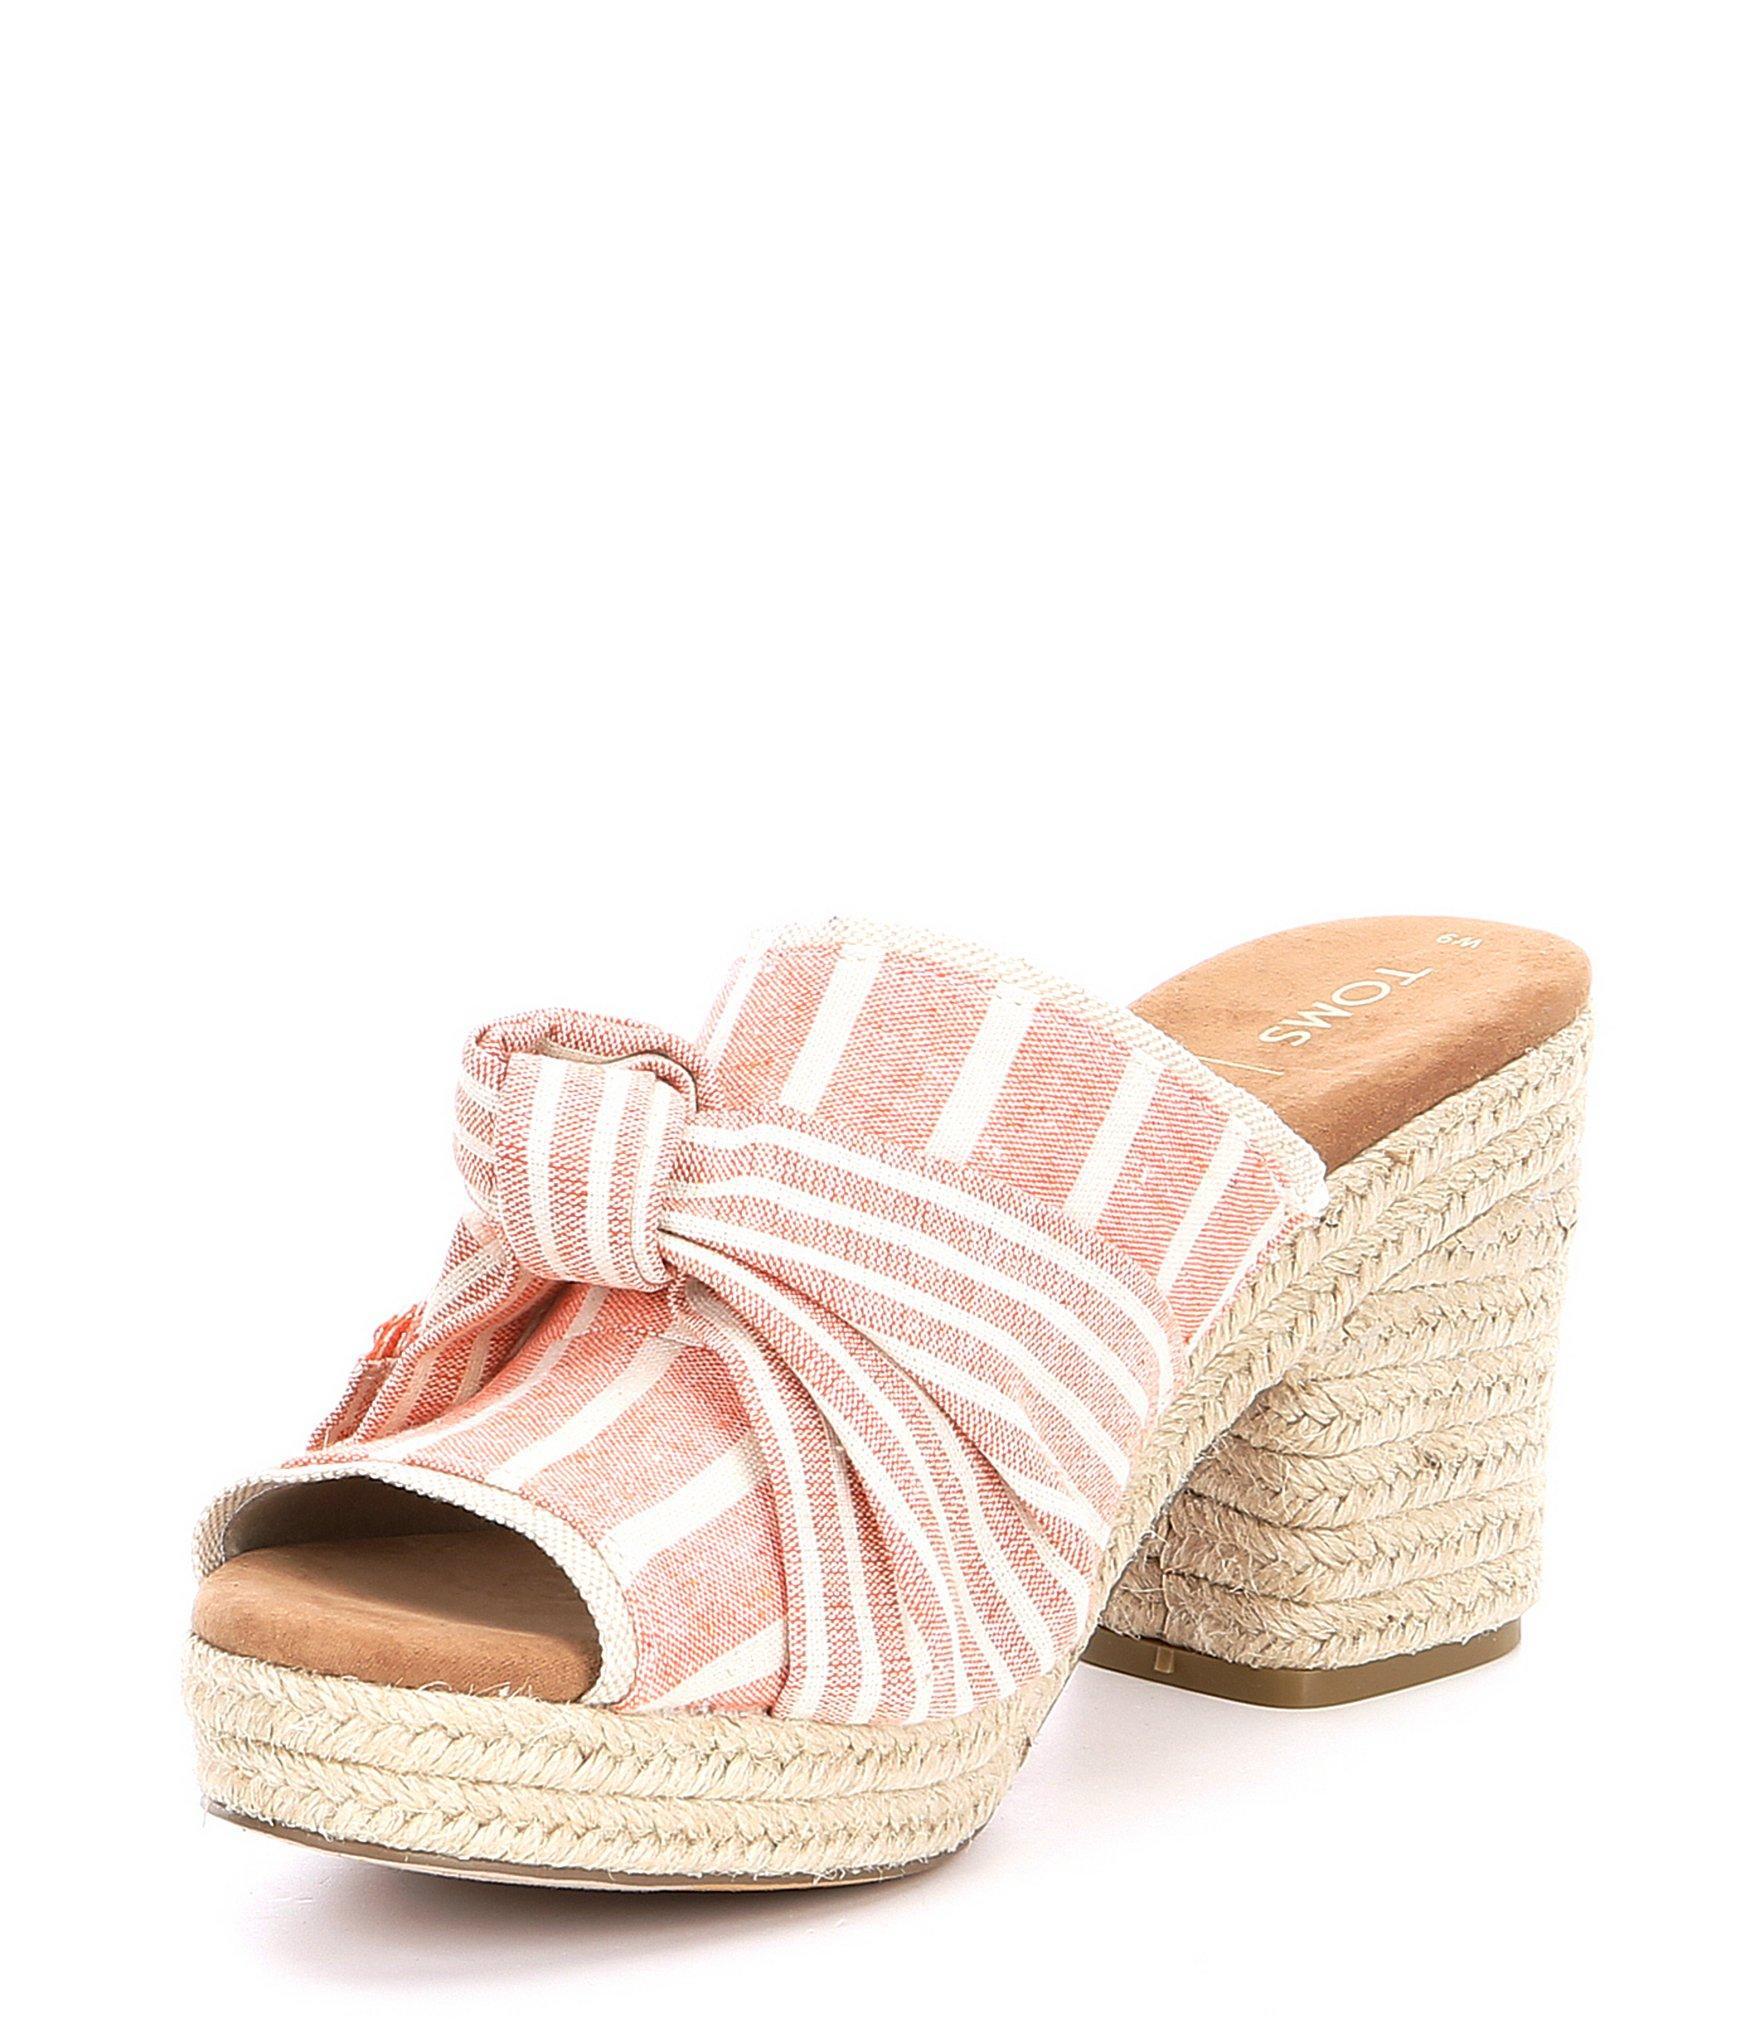 b8bfaba609fa Lyst - TOMS Junie Striped Canvas Block Heel Mules in Pink